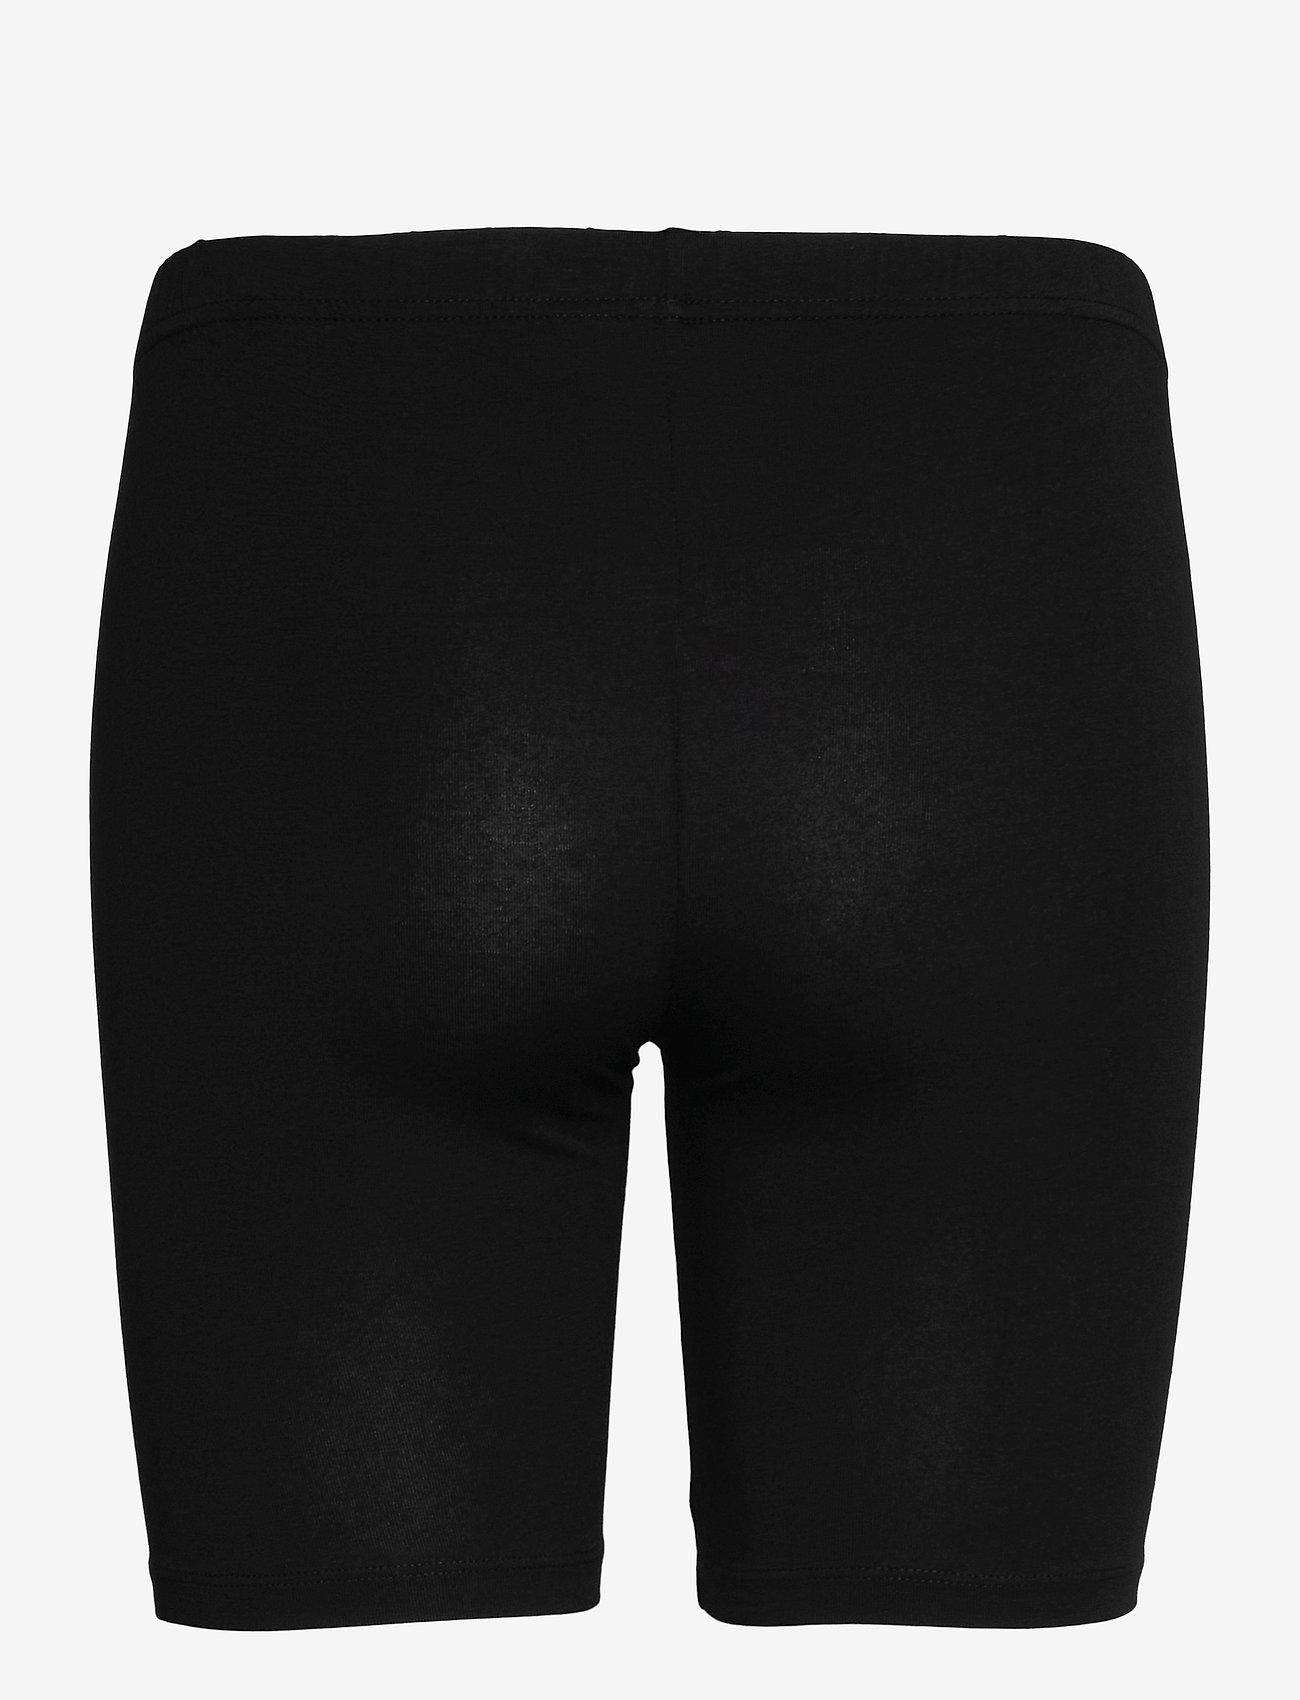 Vero Moda - VMMAXI BIKER SHORTS GA 2PACK - cycling shorts - black - 1